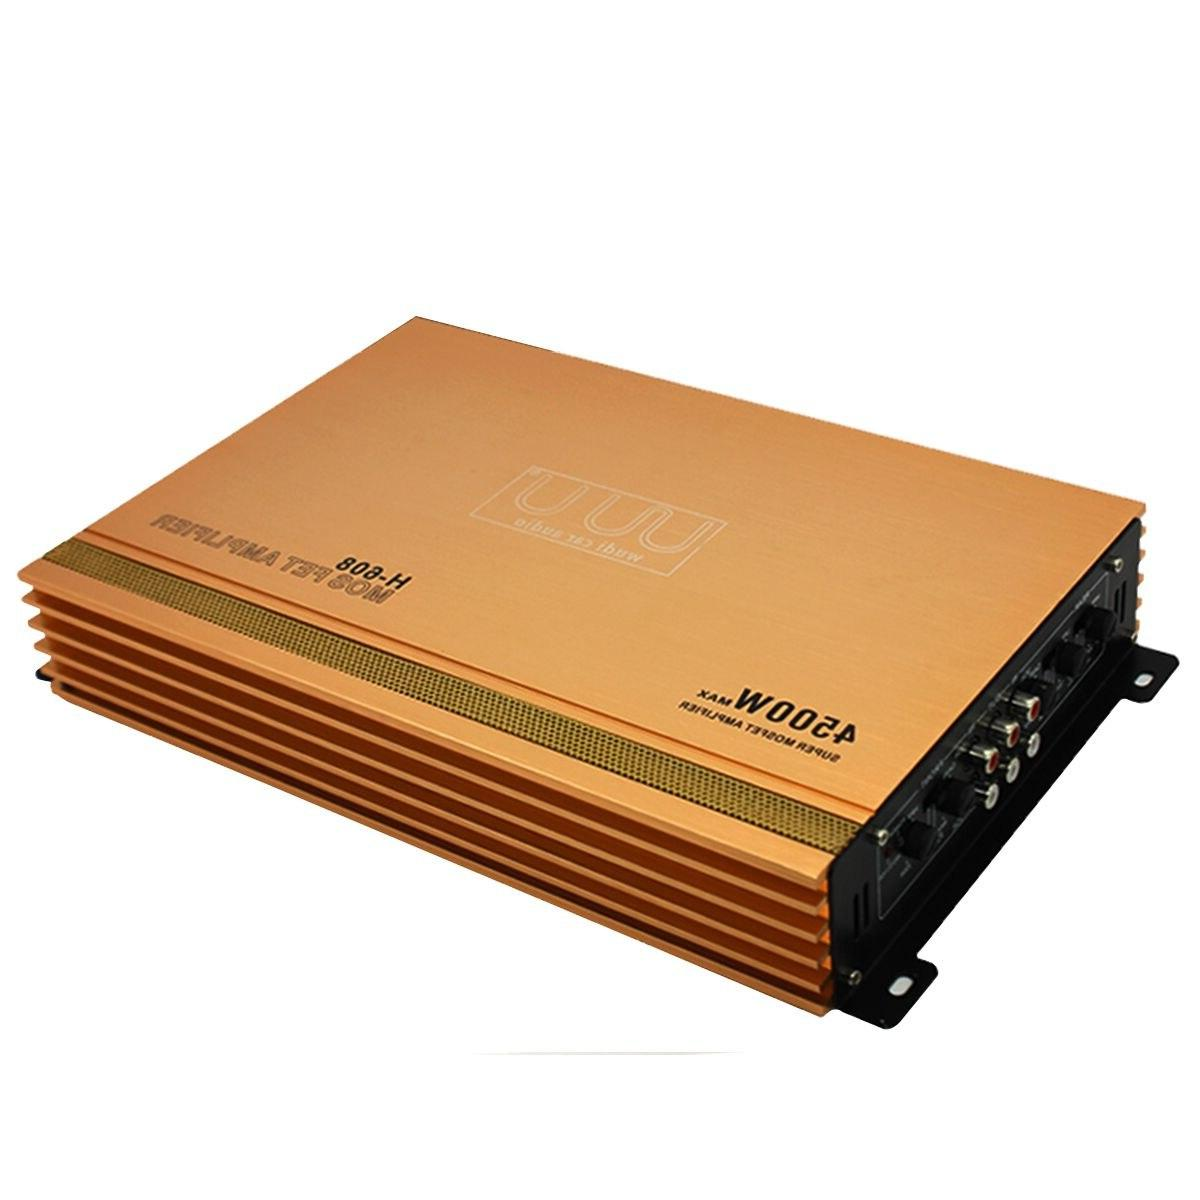 4 High Power <font><b>Amplifier</b></font> Stereo Fidelity Aluminum Alloy Audio <font><b>Amplifiers</b></font>